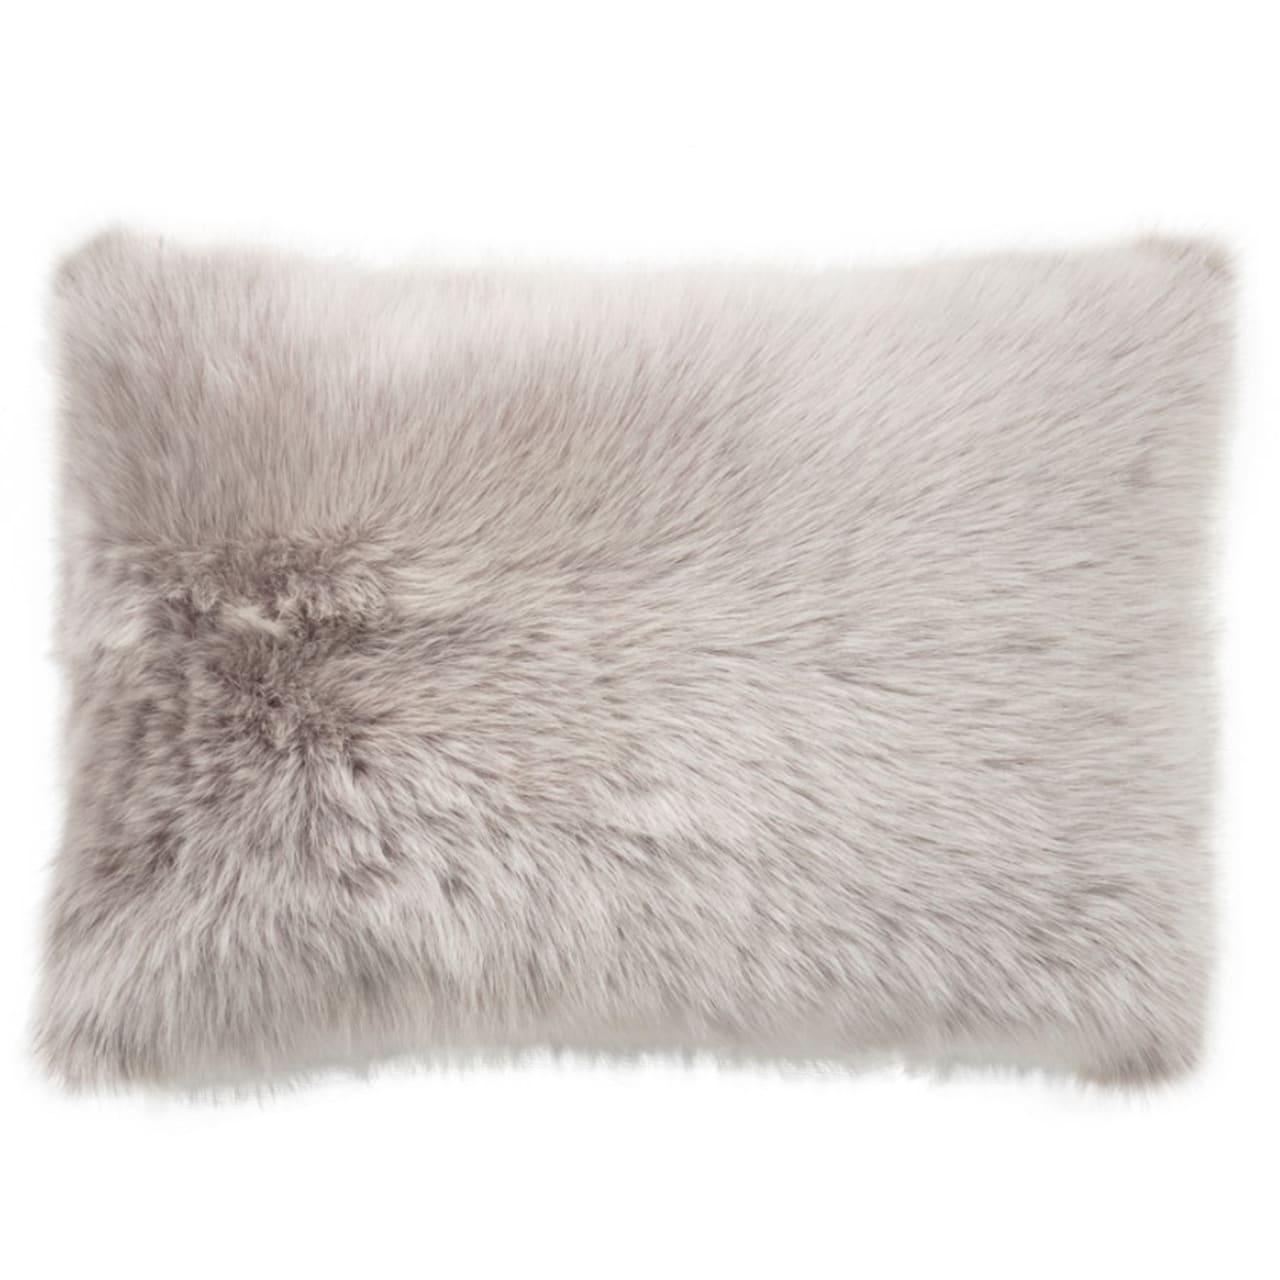 NEW-Shearling Pillow- Topo- 35x55cm (SPTOPTO3555) - ANVOGG FEEL SHEARLING | ANVOGG